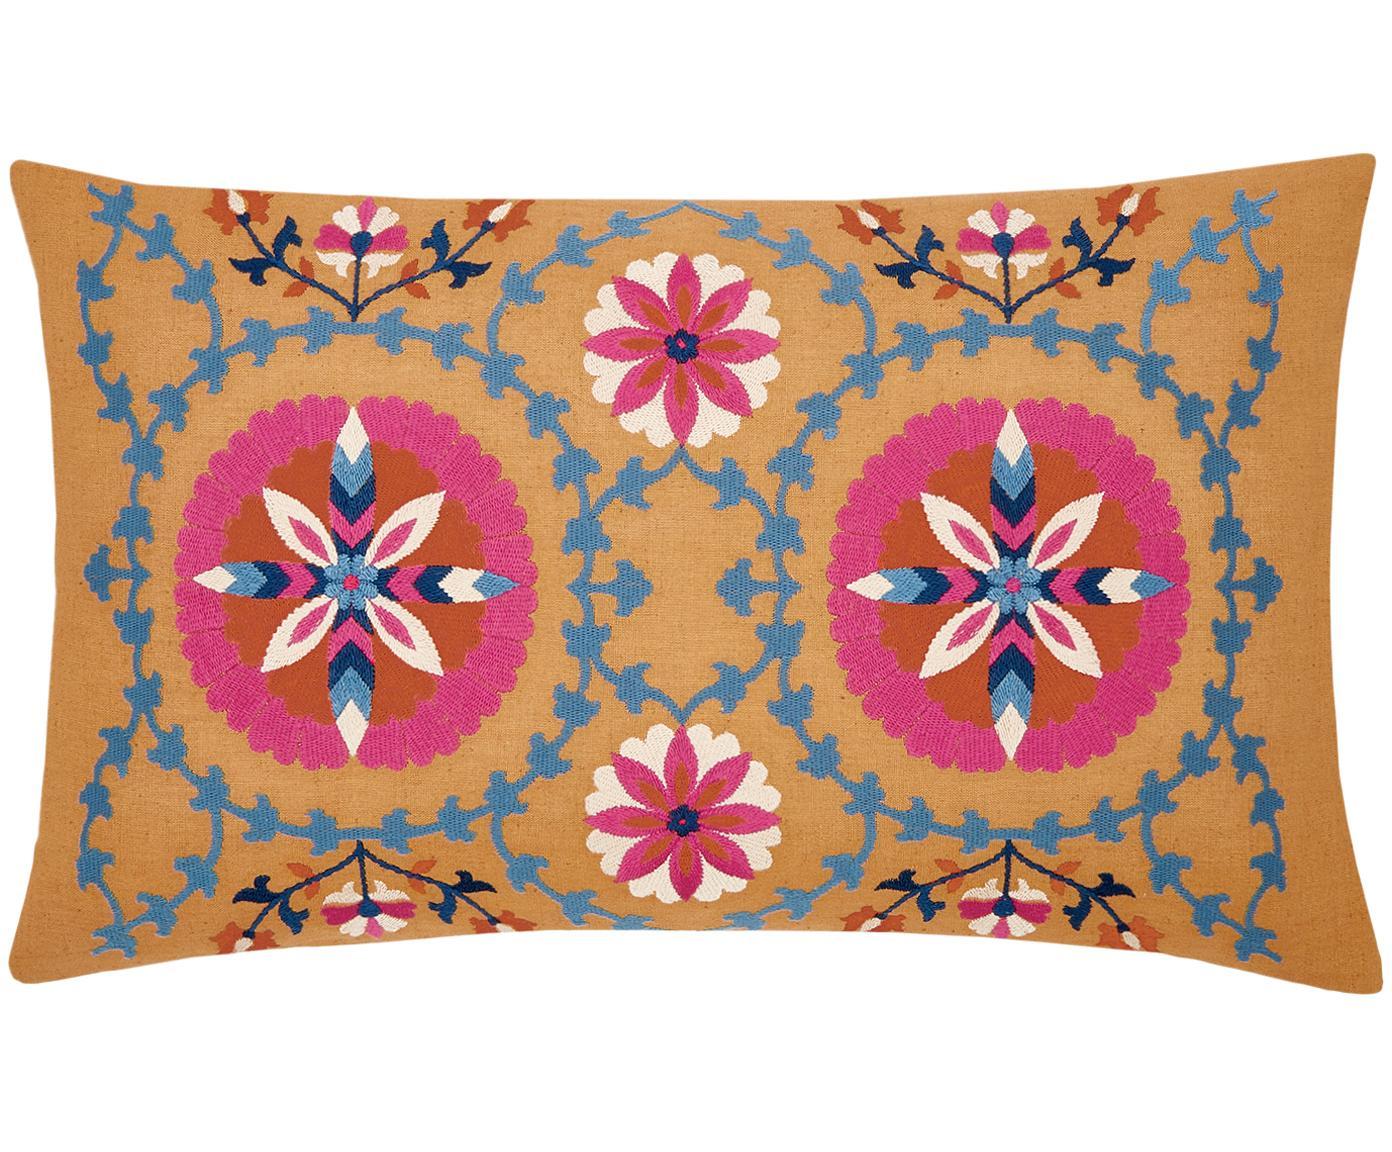 Geborduurde  kussenhoes Tabula, Katoen, Geel, multicolour, 30 x 50 cm